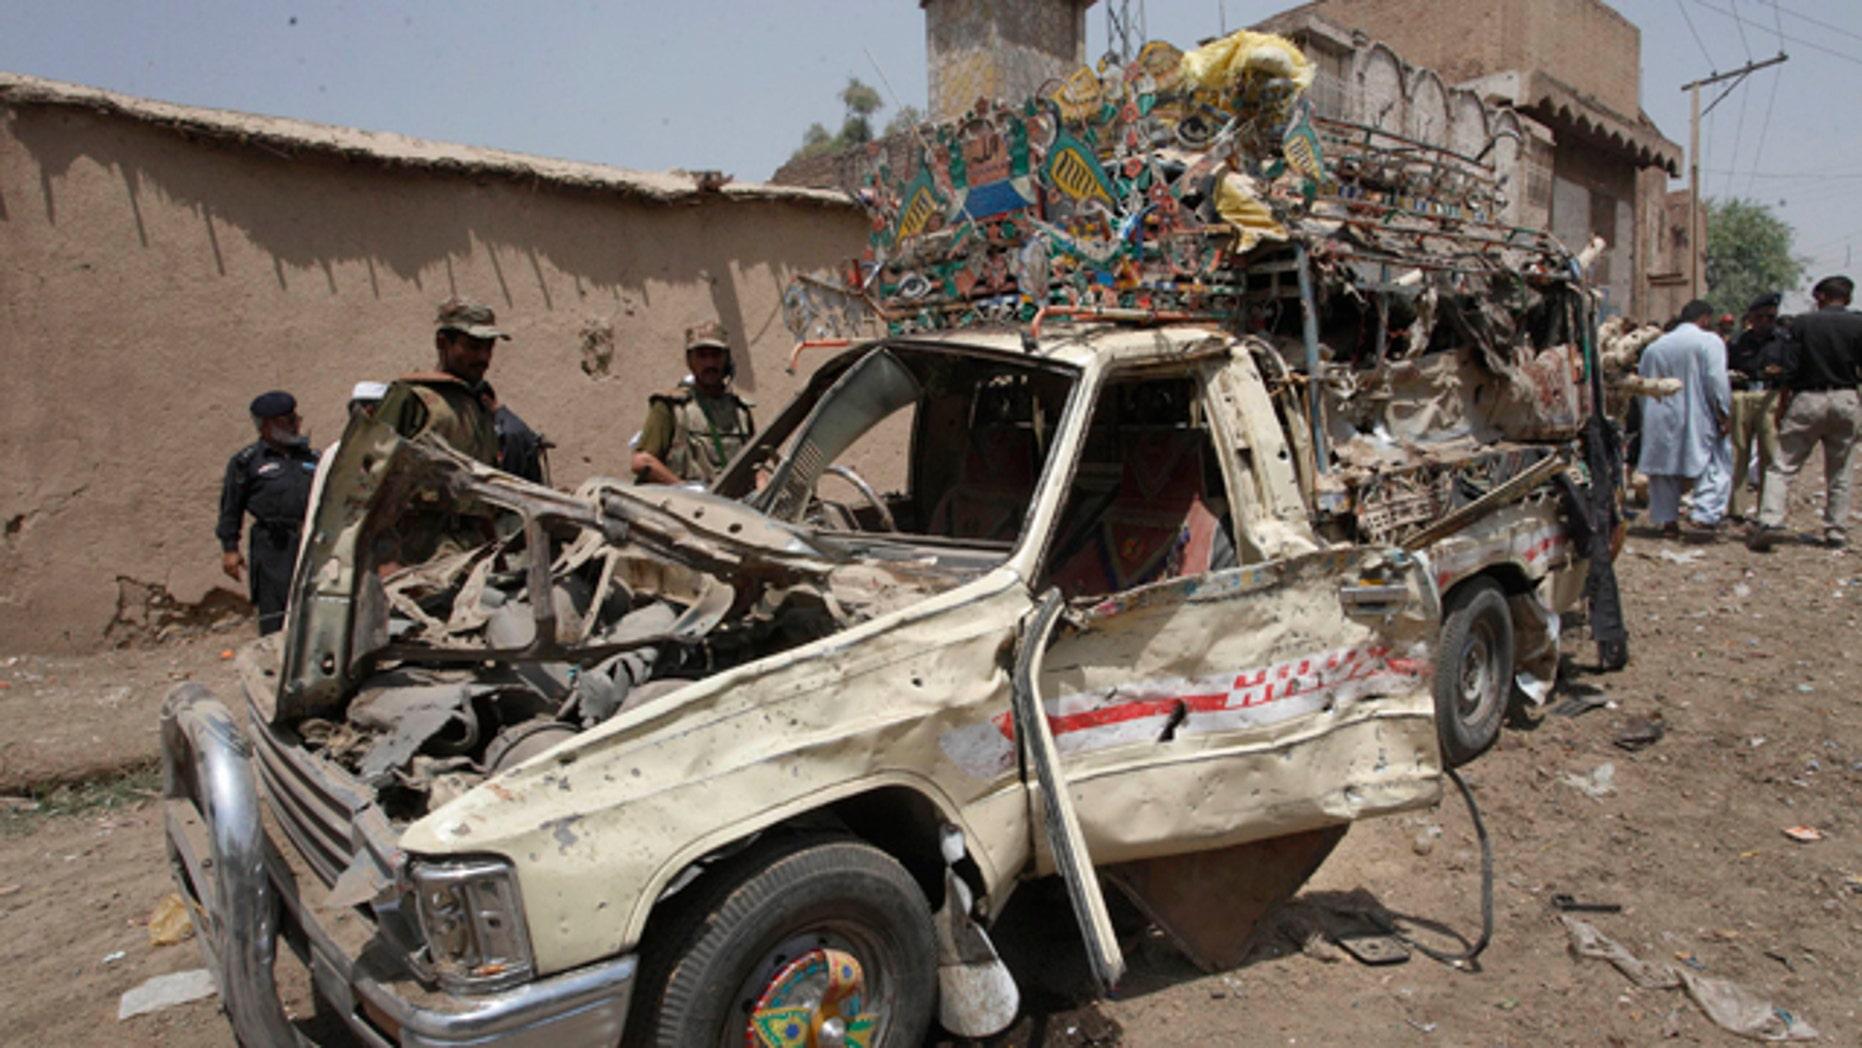 June 9: Pakistani security officials visit the site of a blast in Matani Near Peshawar, Pakistan.